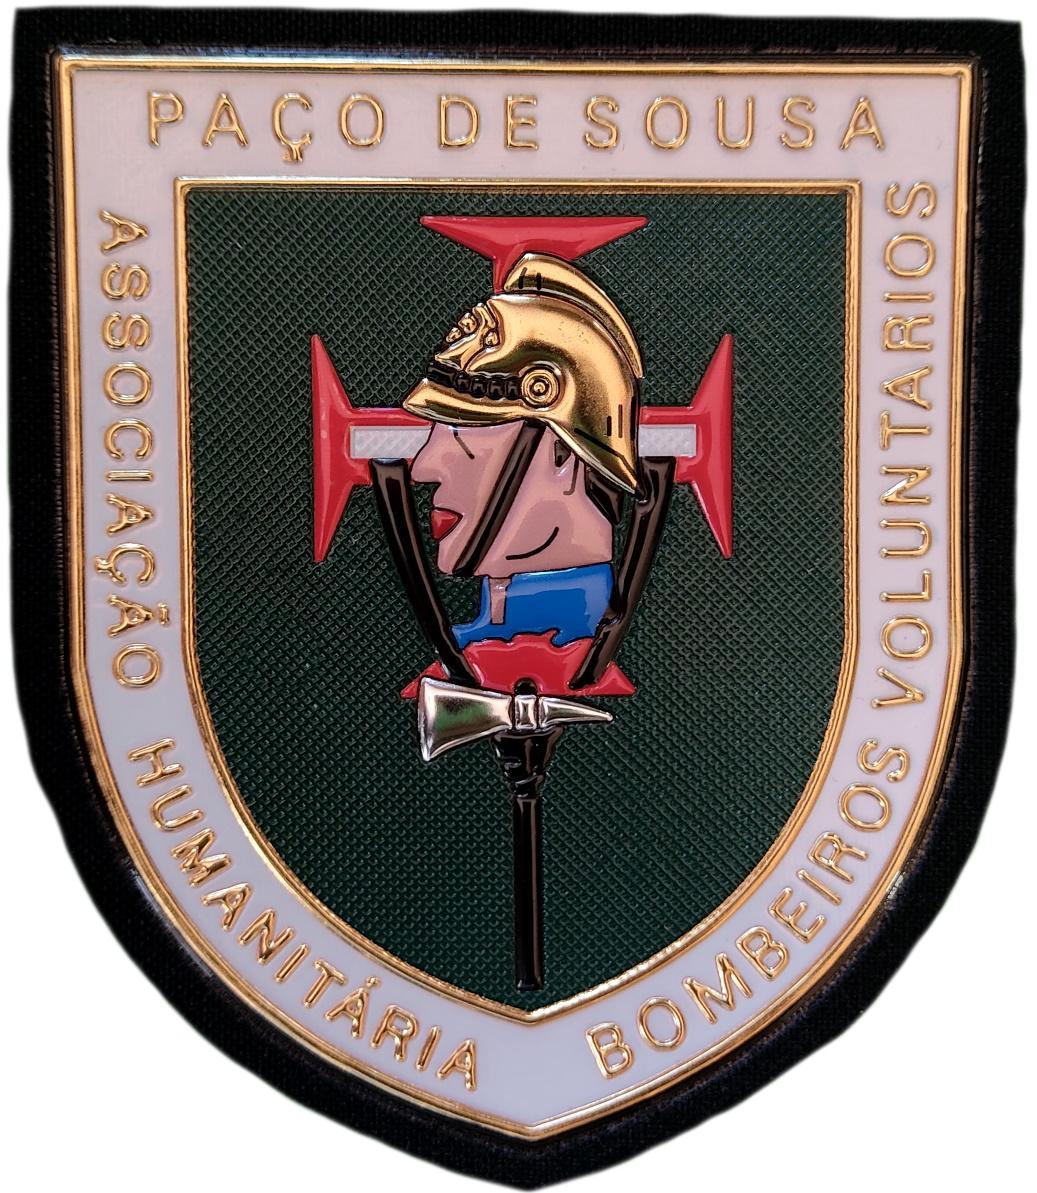 Bomberos Voluntarios Paço de Sousa Portugal parche insignia emblema distintivo